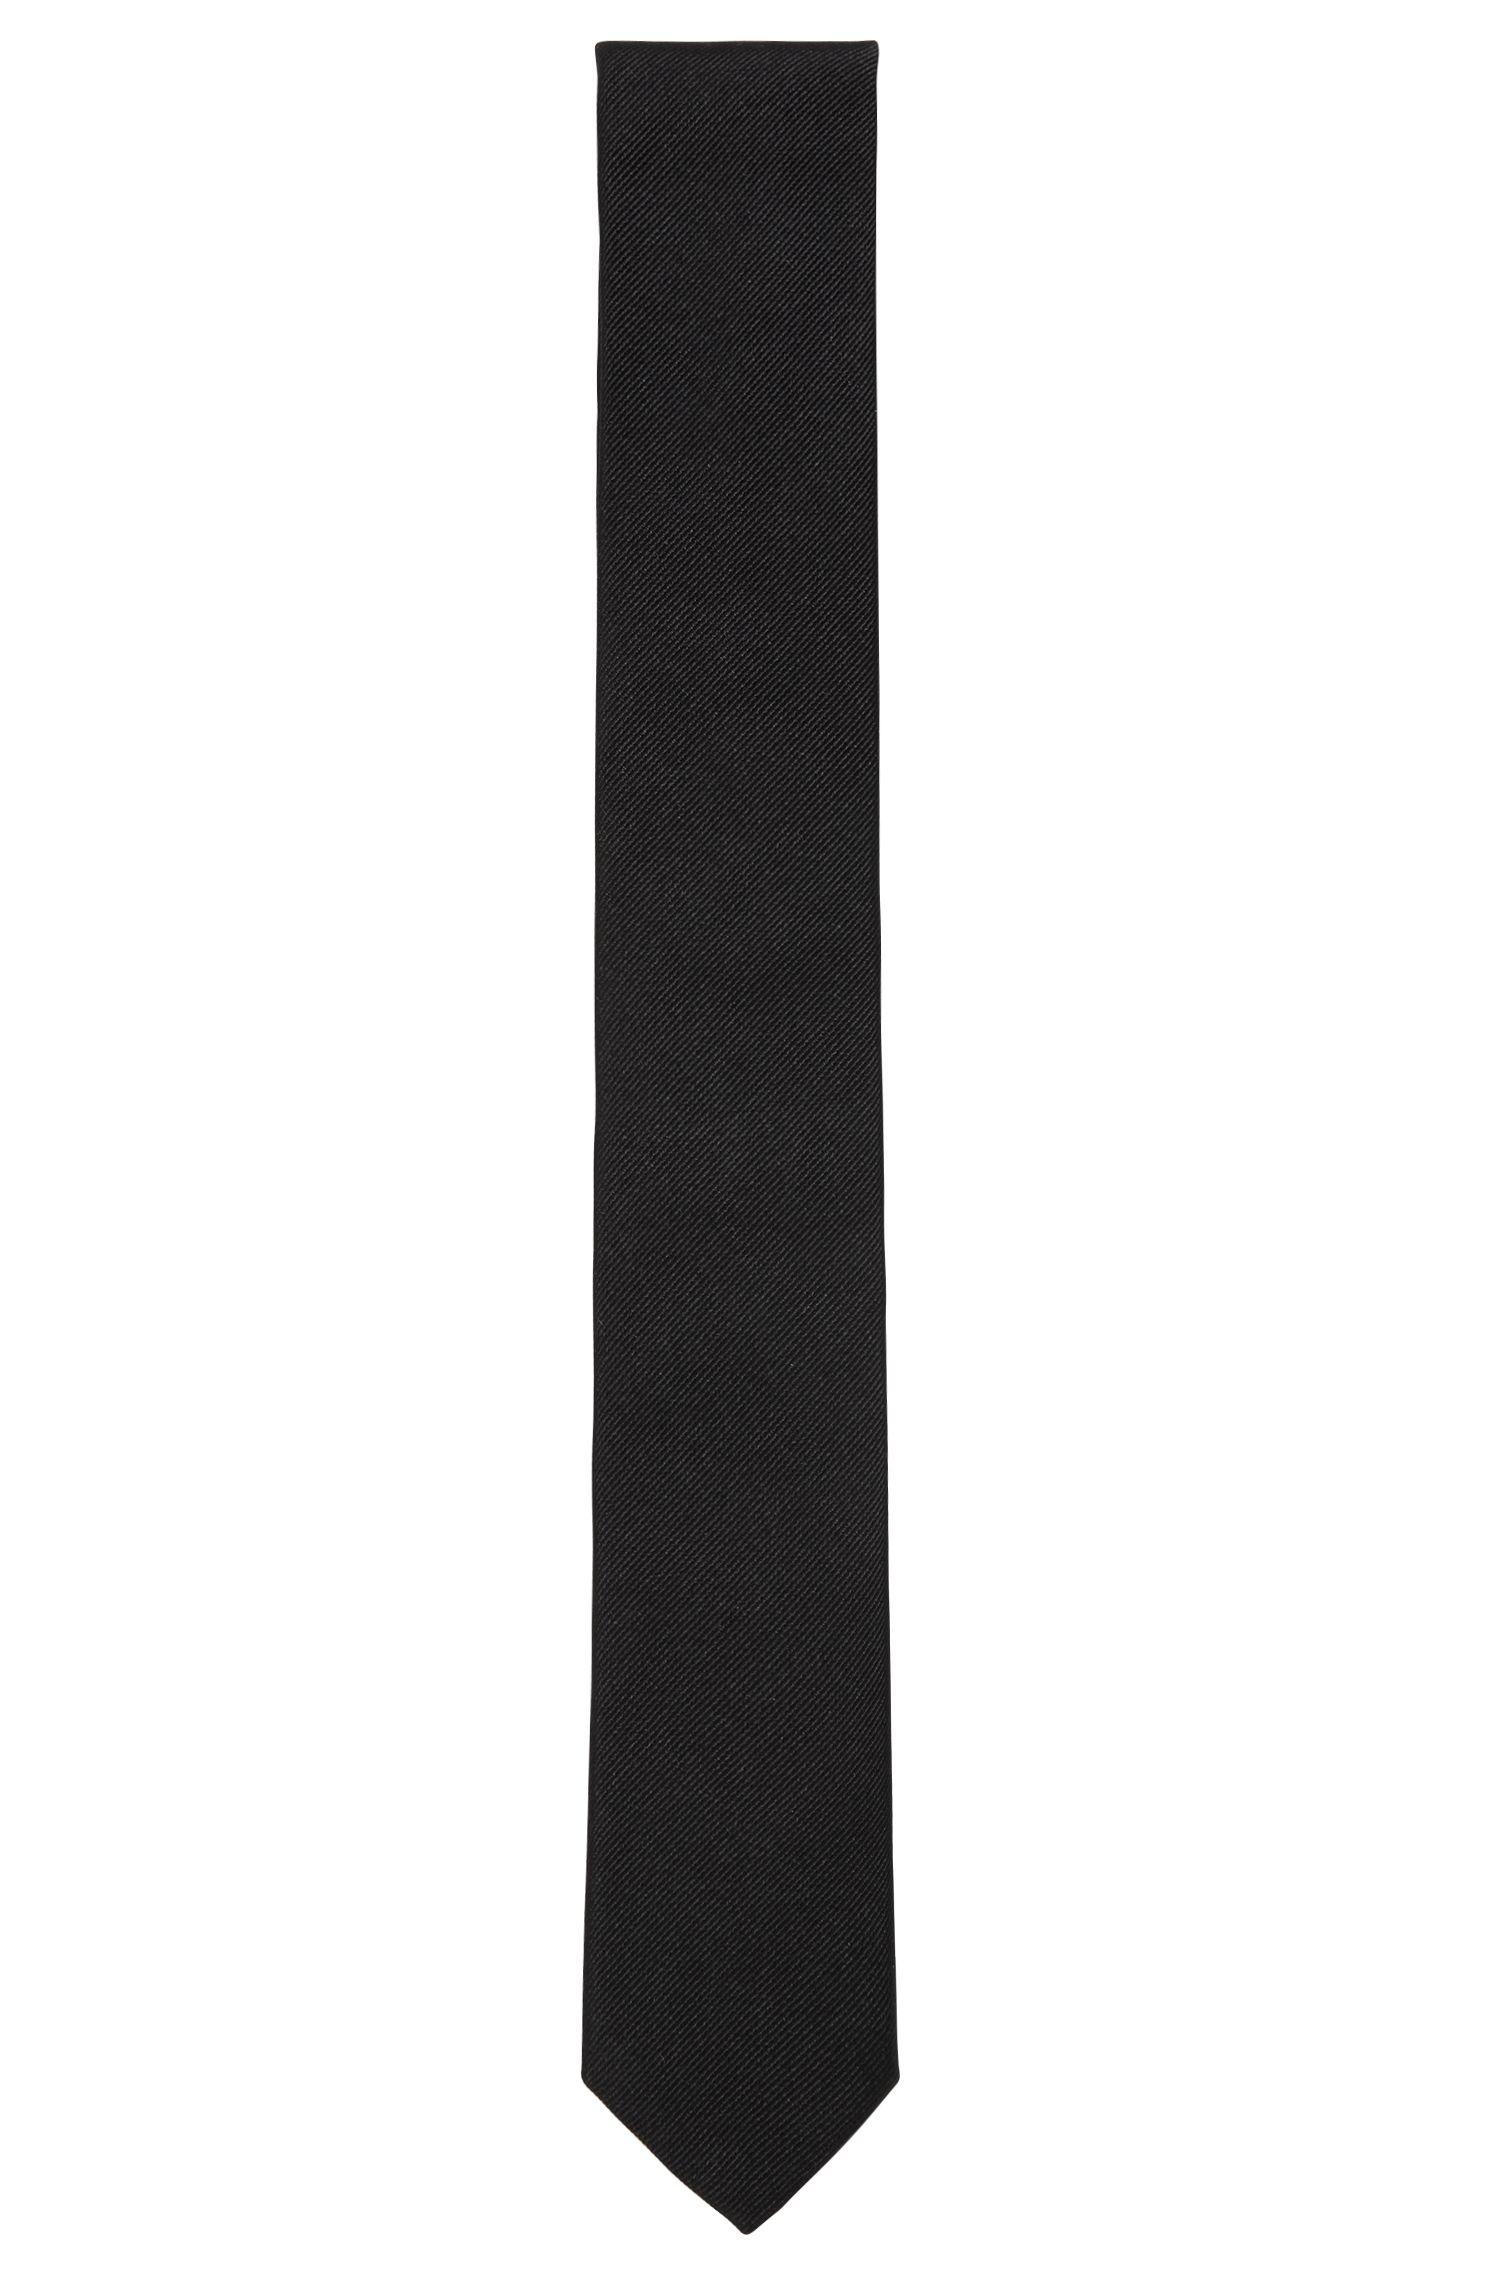 Corbata jacquard de seda con tacto satinado, Negro